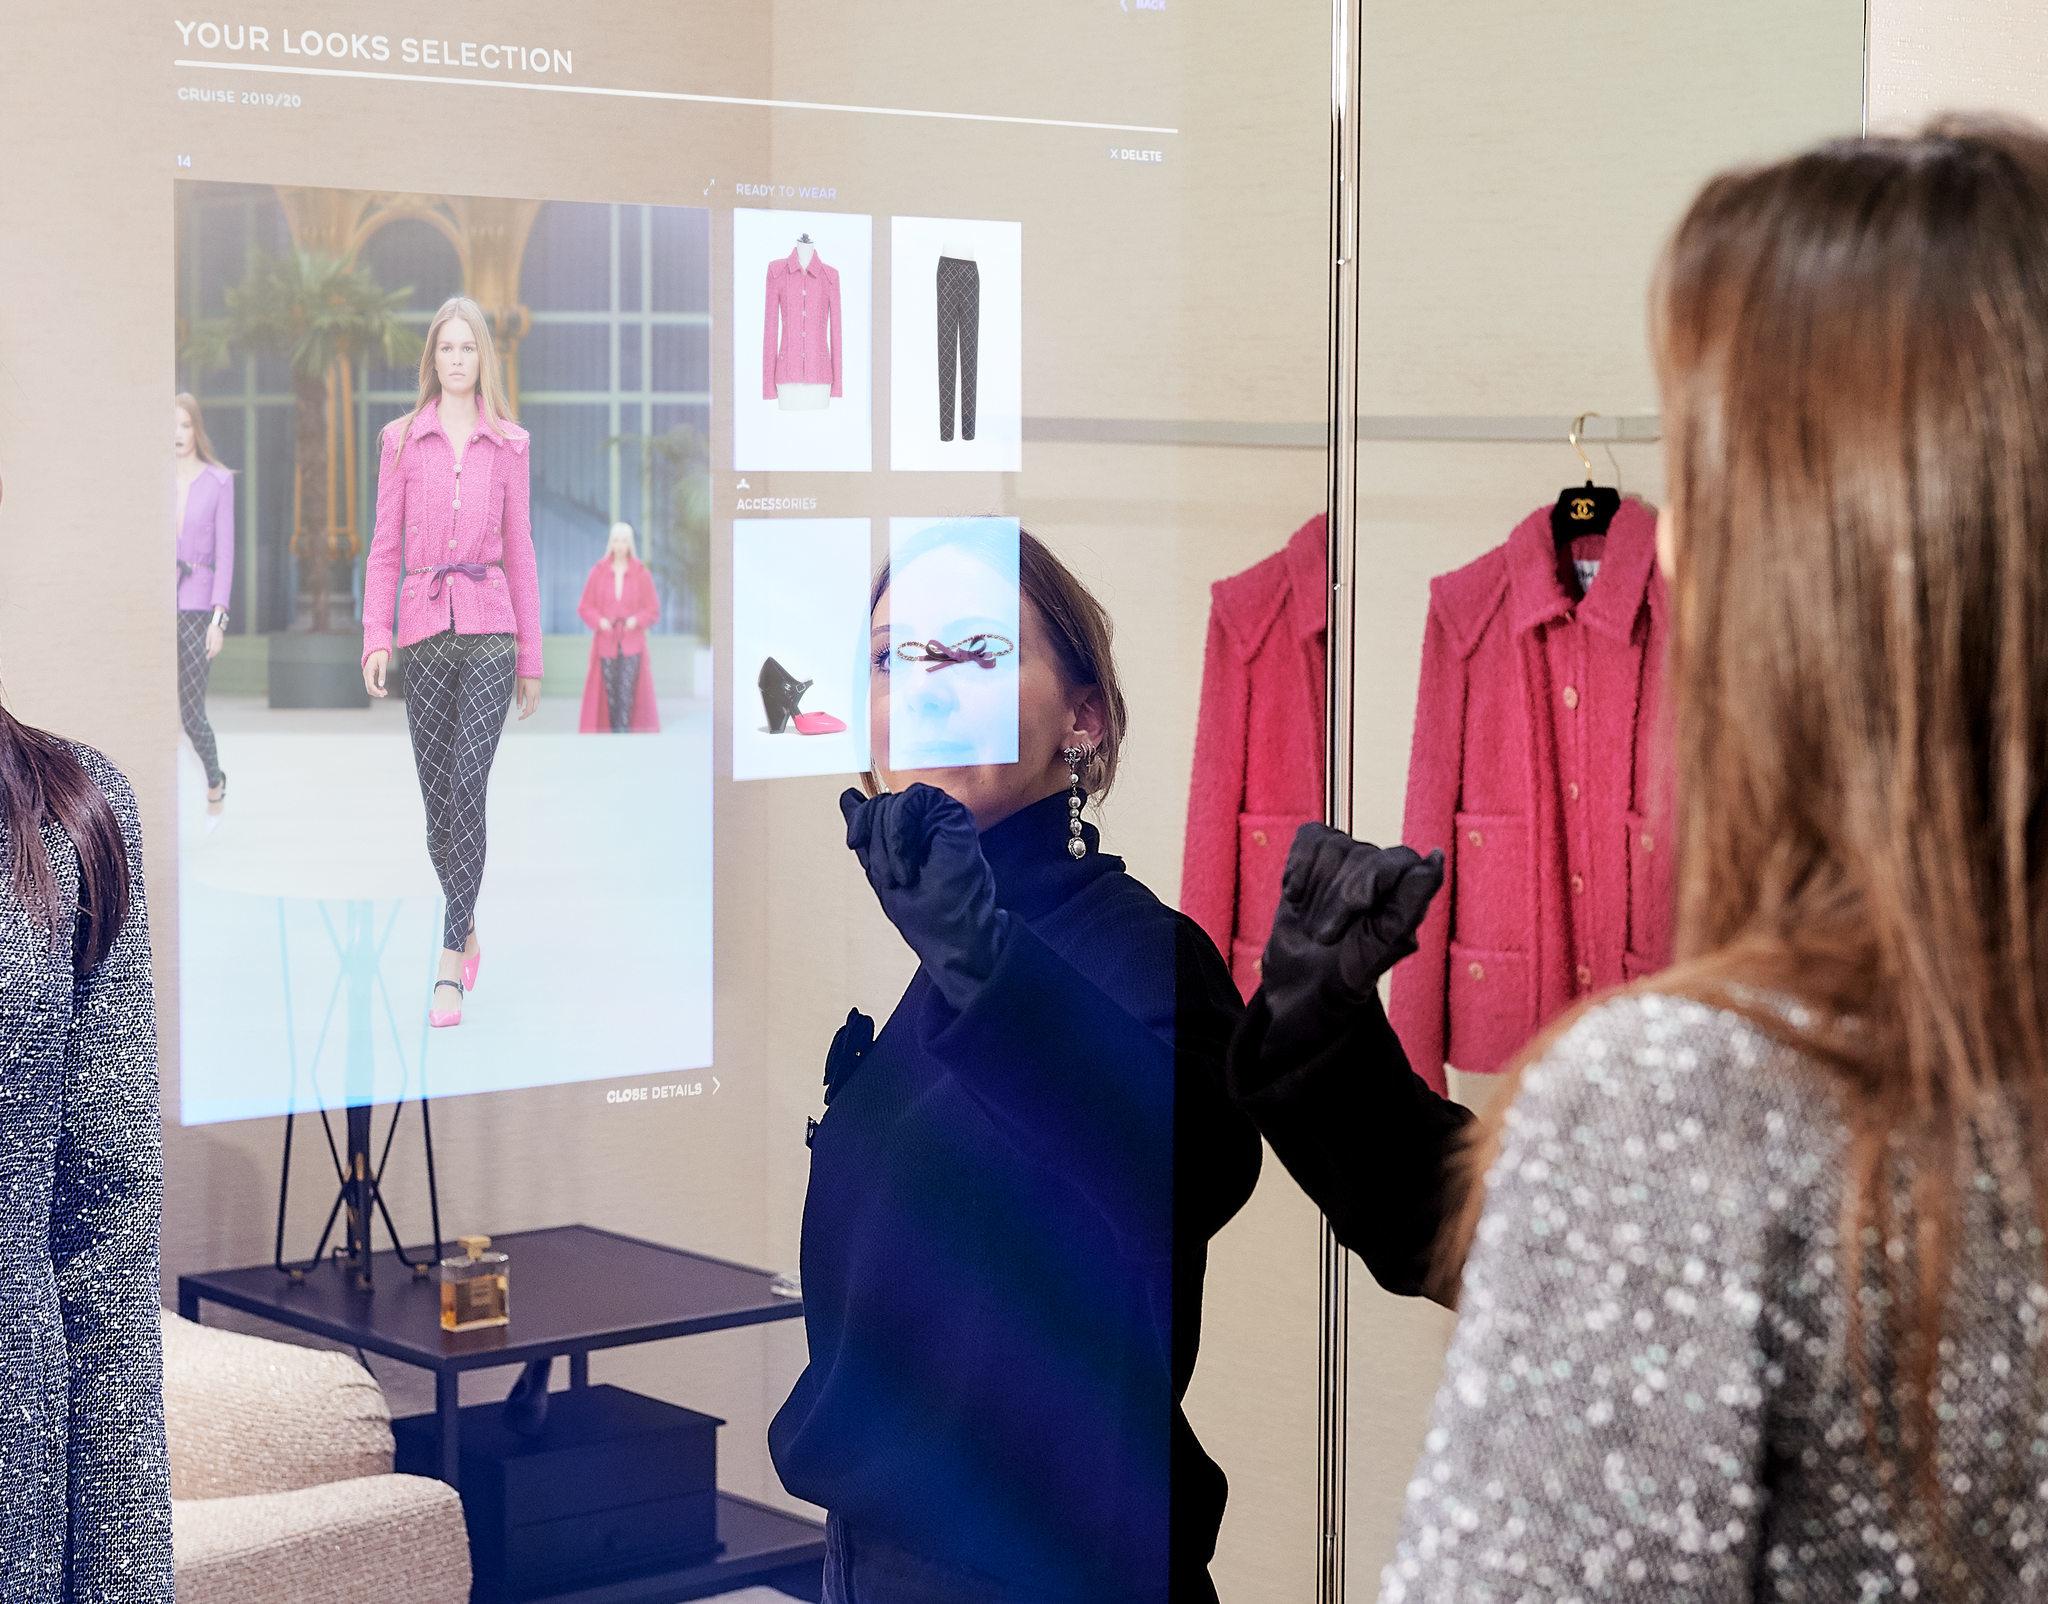 Chanel 与奢侈品电商 Farfetch 合作打造高科技门店试点